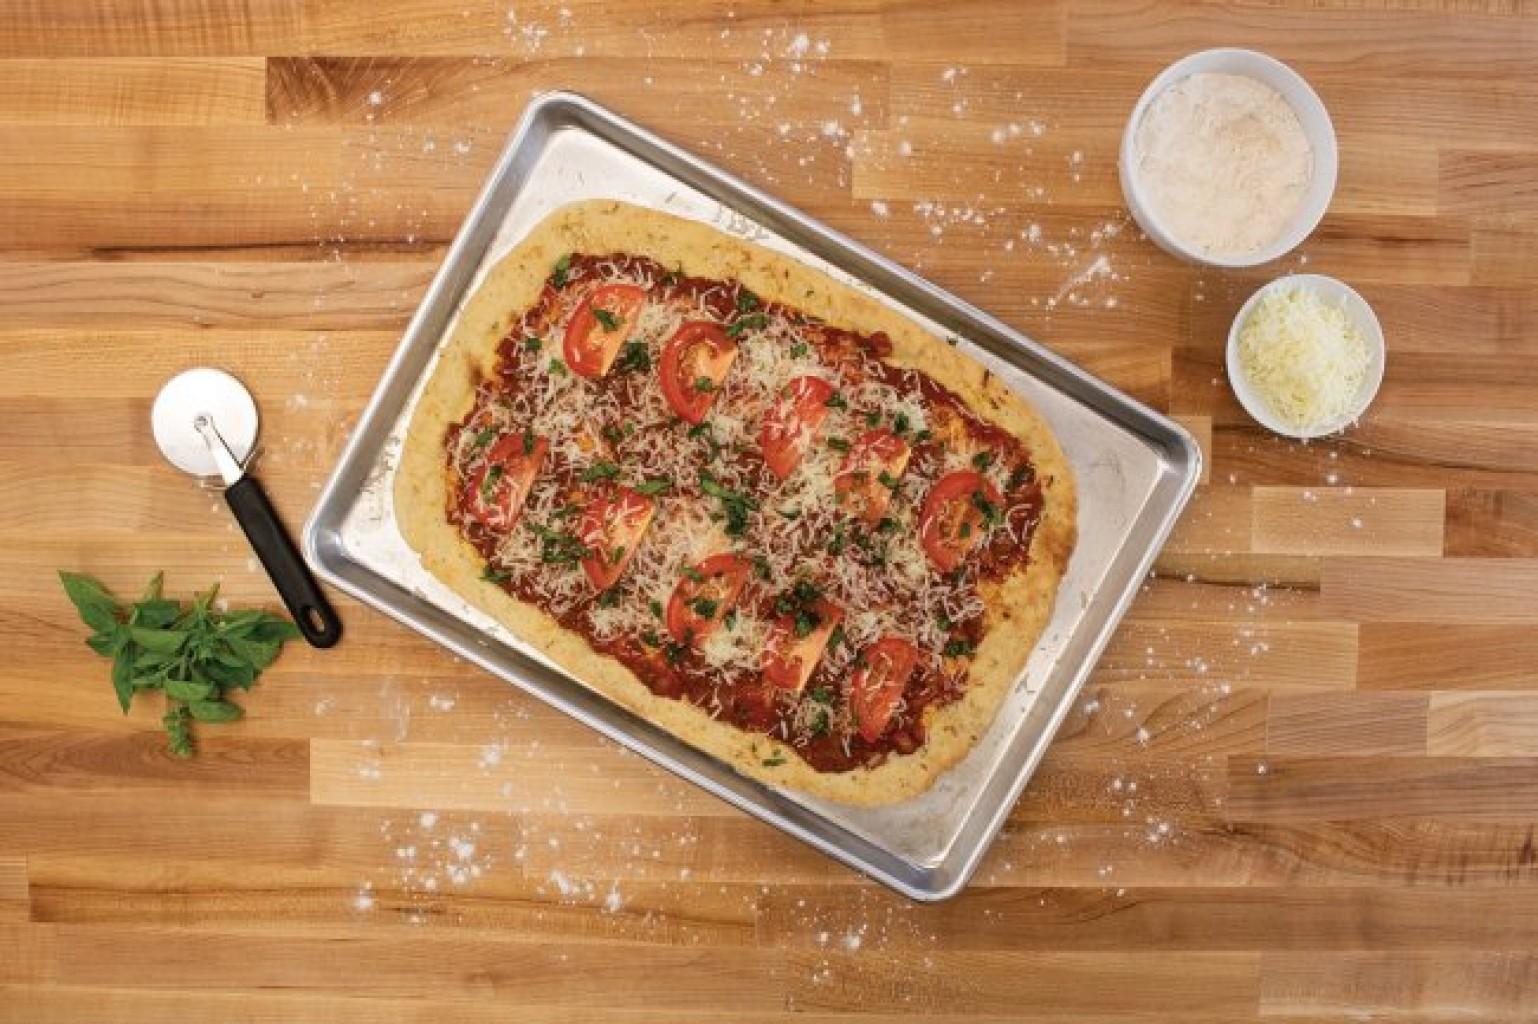 Receta de La Semana: PIZZA MARGHERITA CASERA